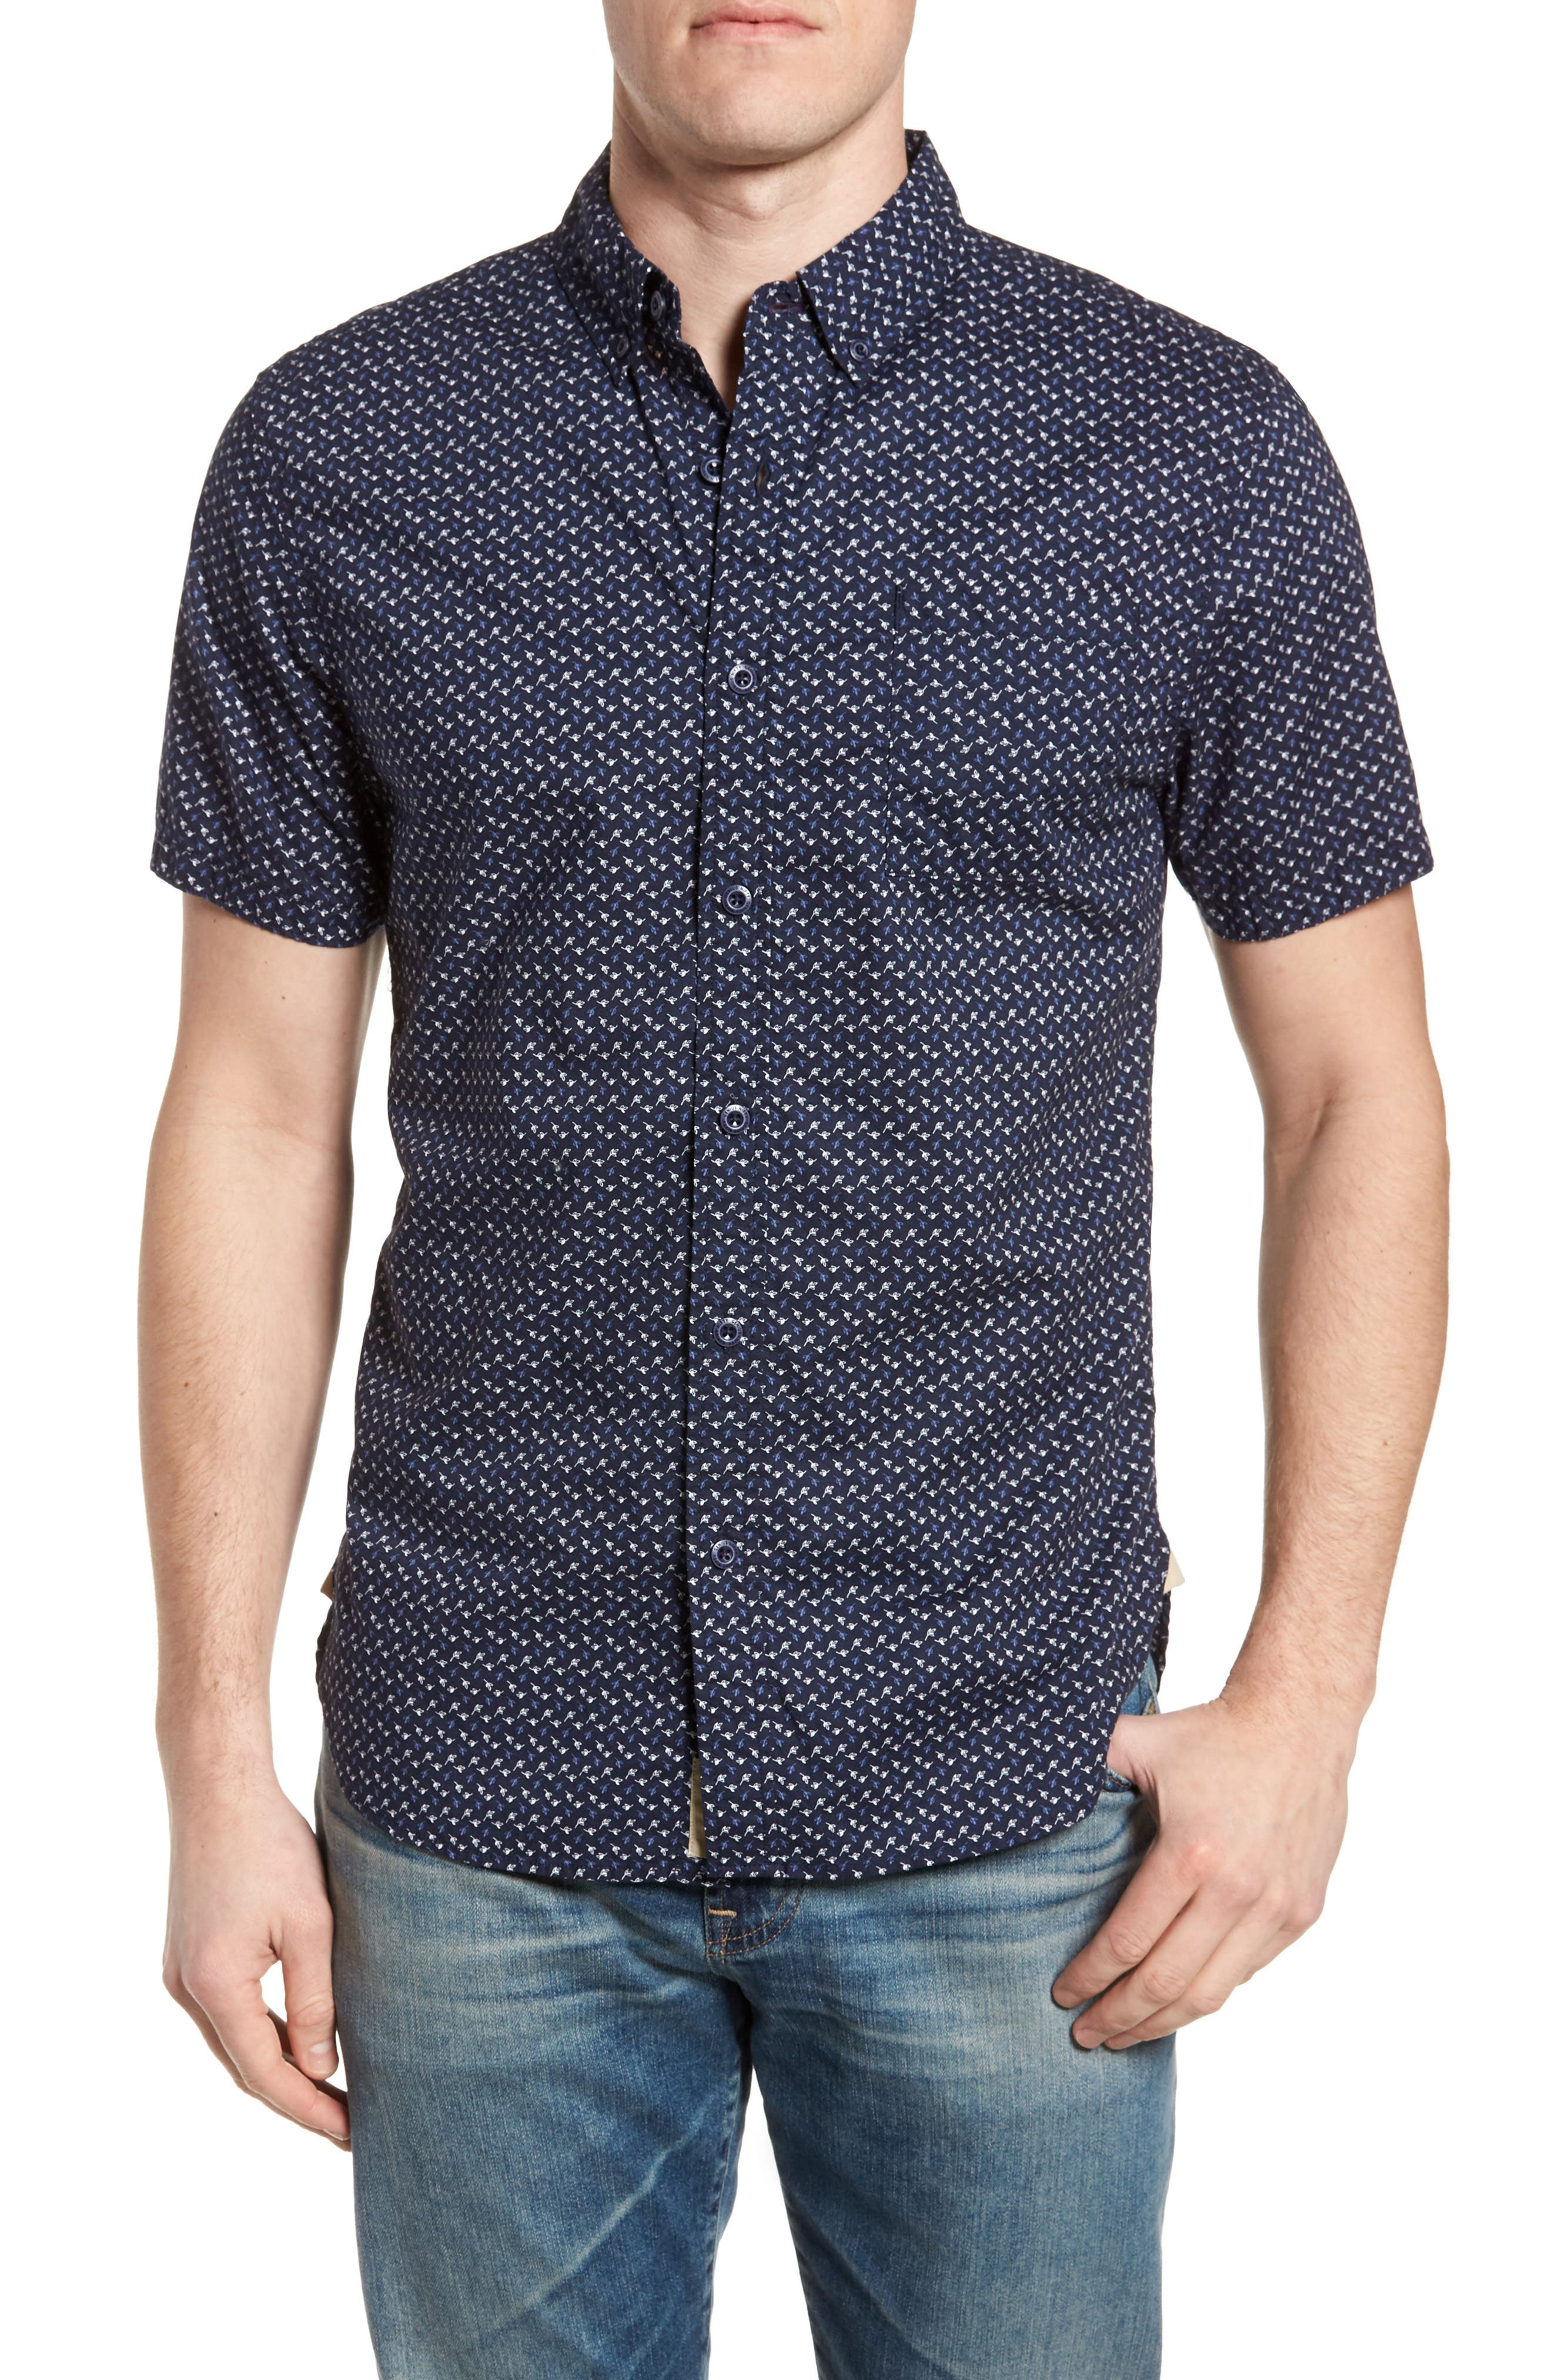 Truman Slim Fit Short Sleeve Sport Shirt,                             Main thumbnail 1, color,                             401